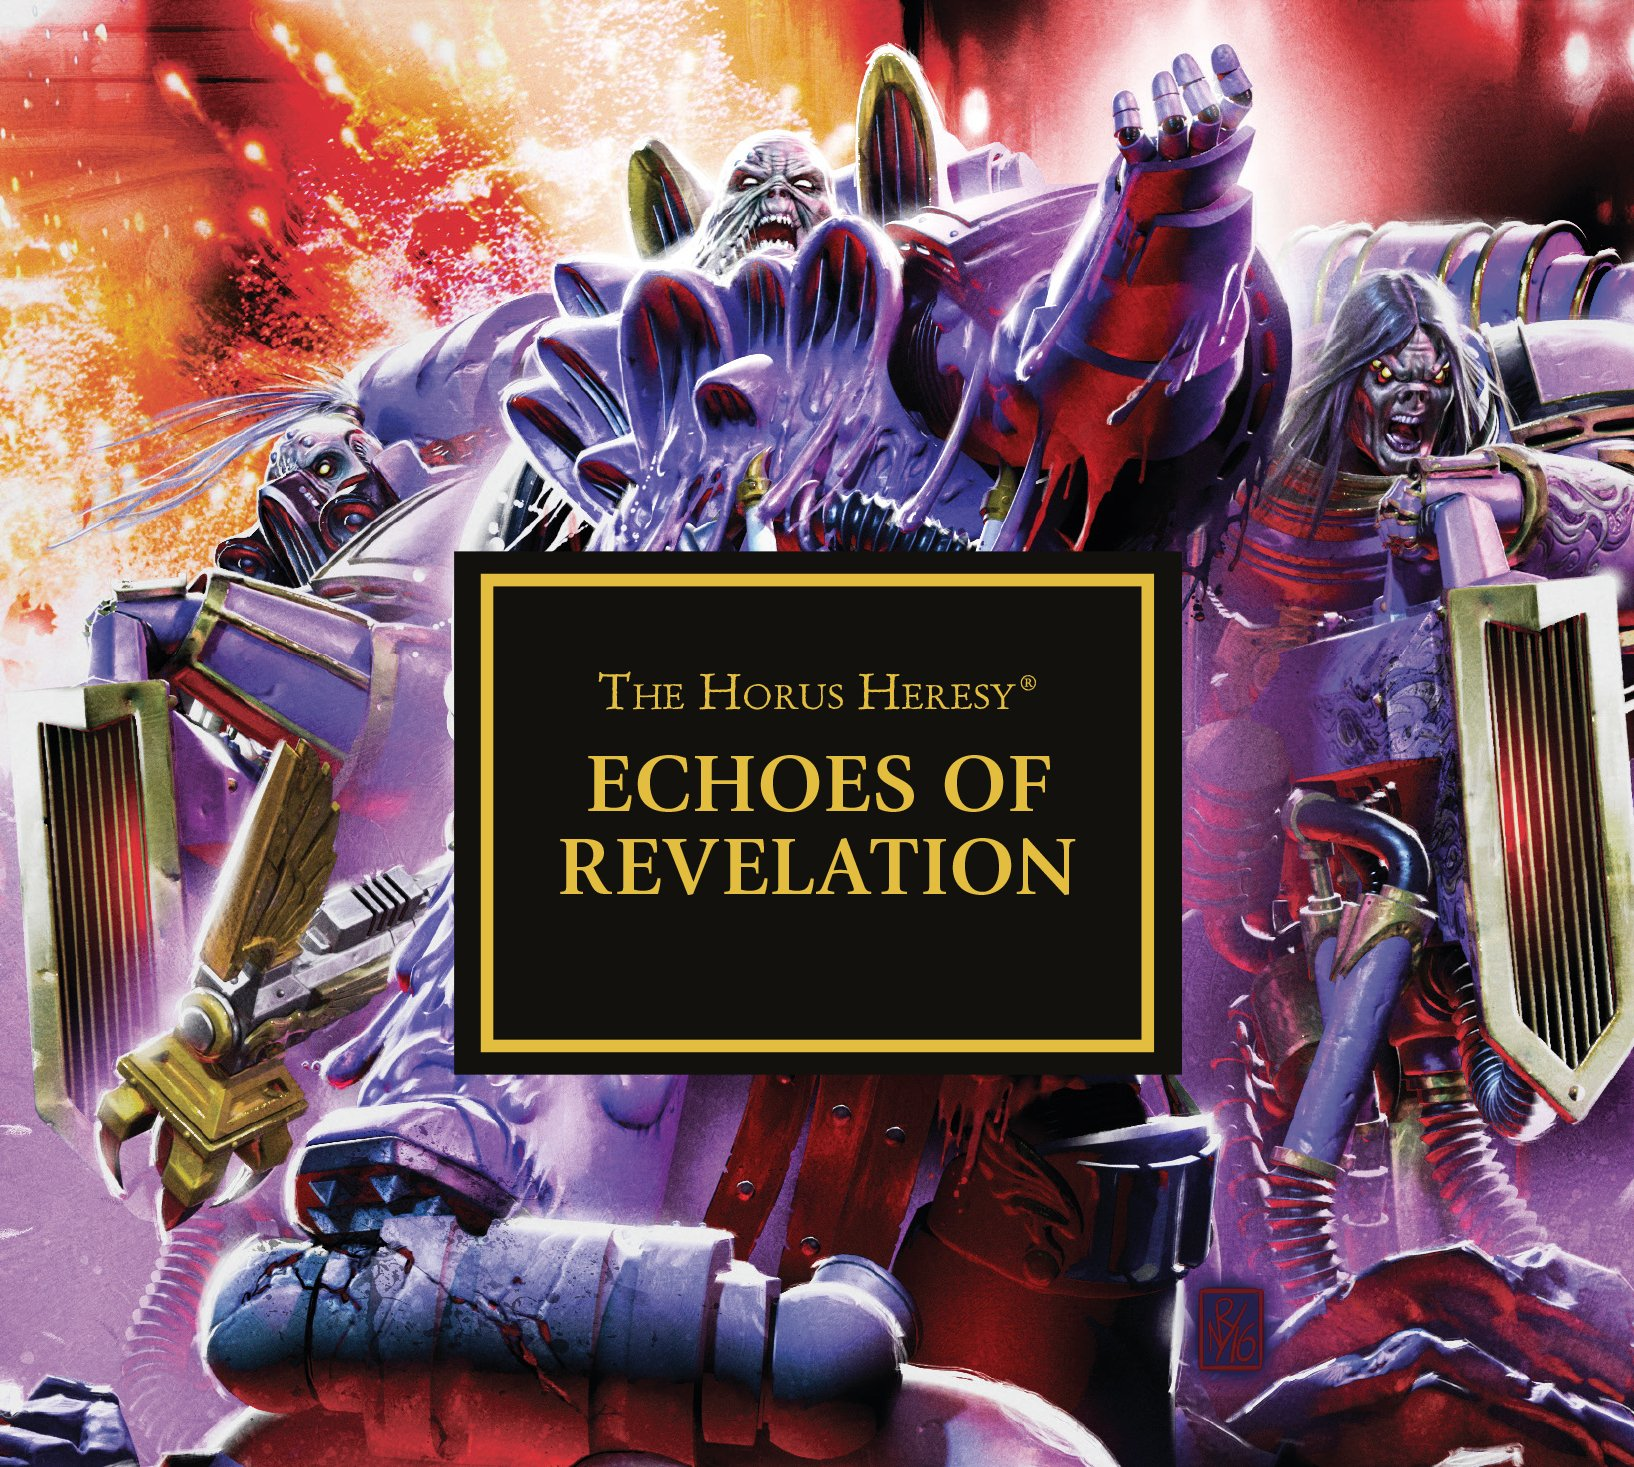 Echoes-of-Revelation-Case.indd